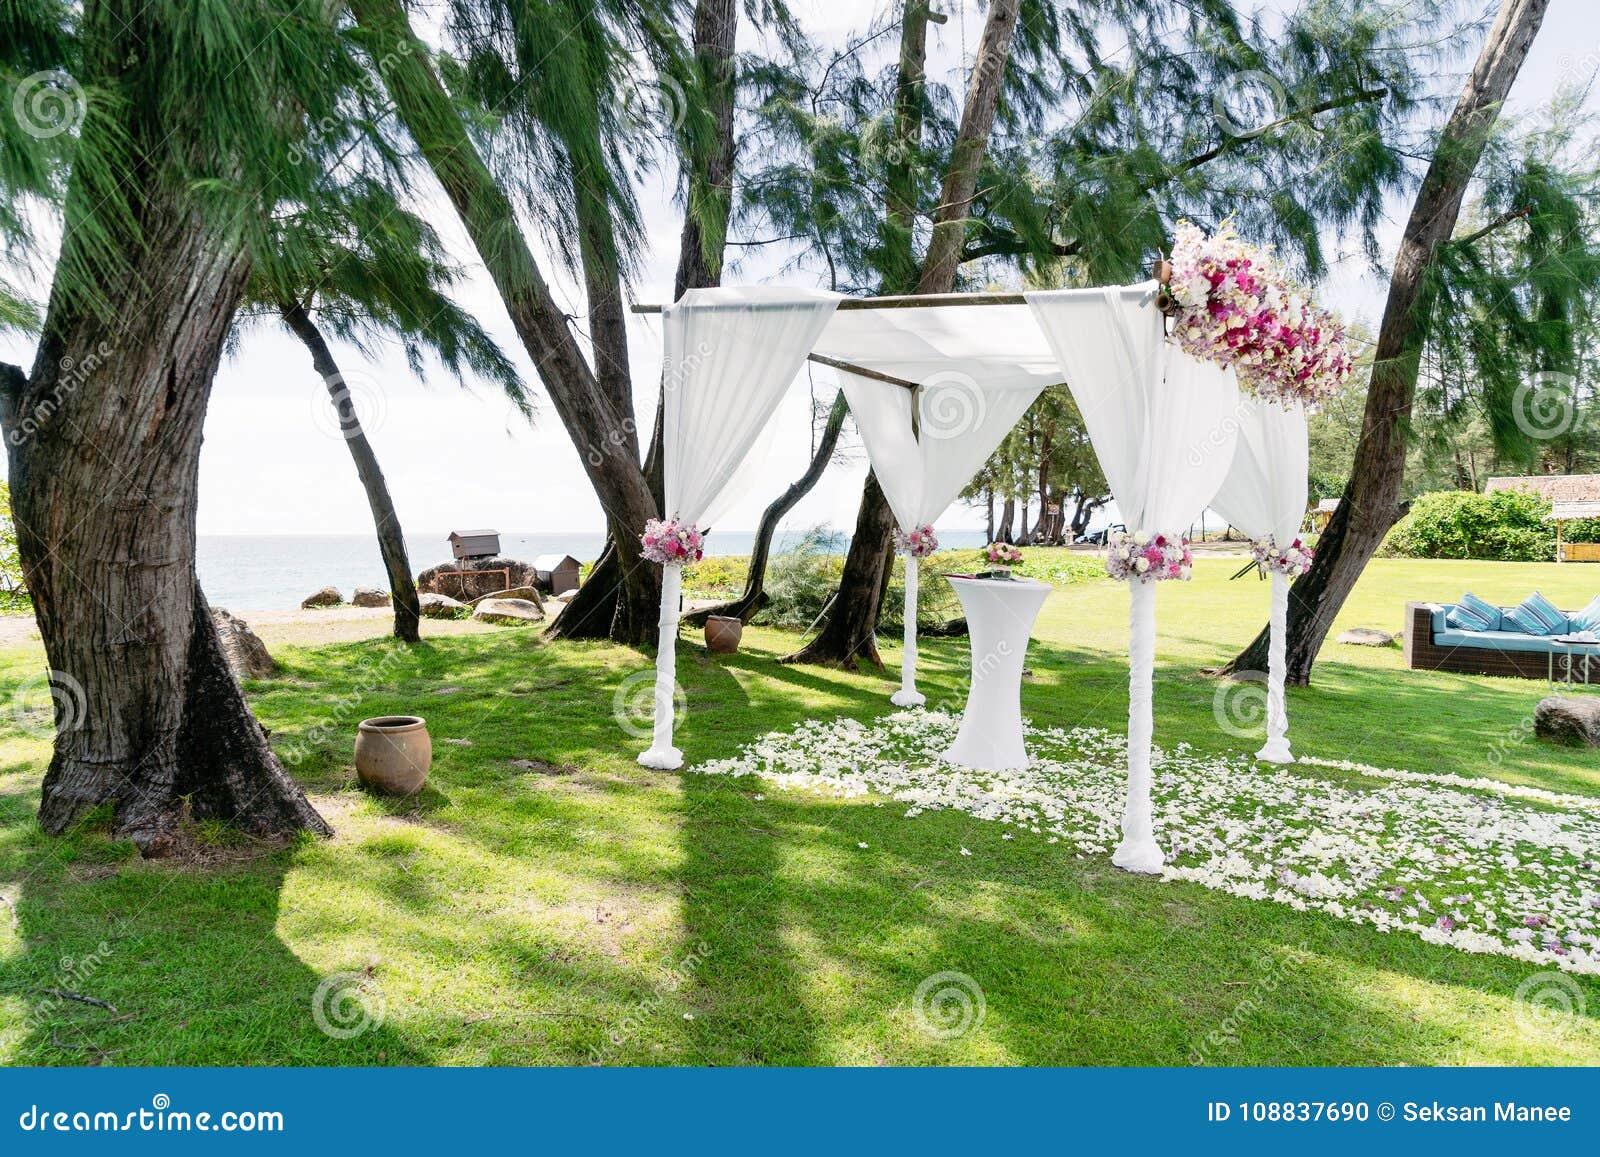 Wedding Arch Decoration Flower Floral Wedding Venue Pine Tree Ocean View Stock Photo Image Of Bouquet Ocean 108837690